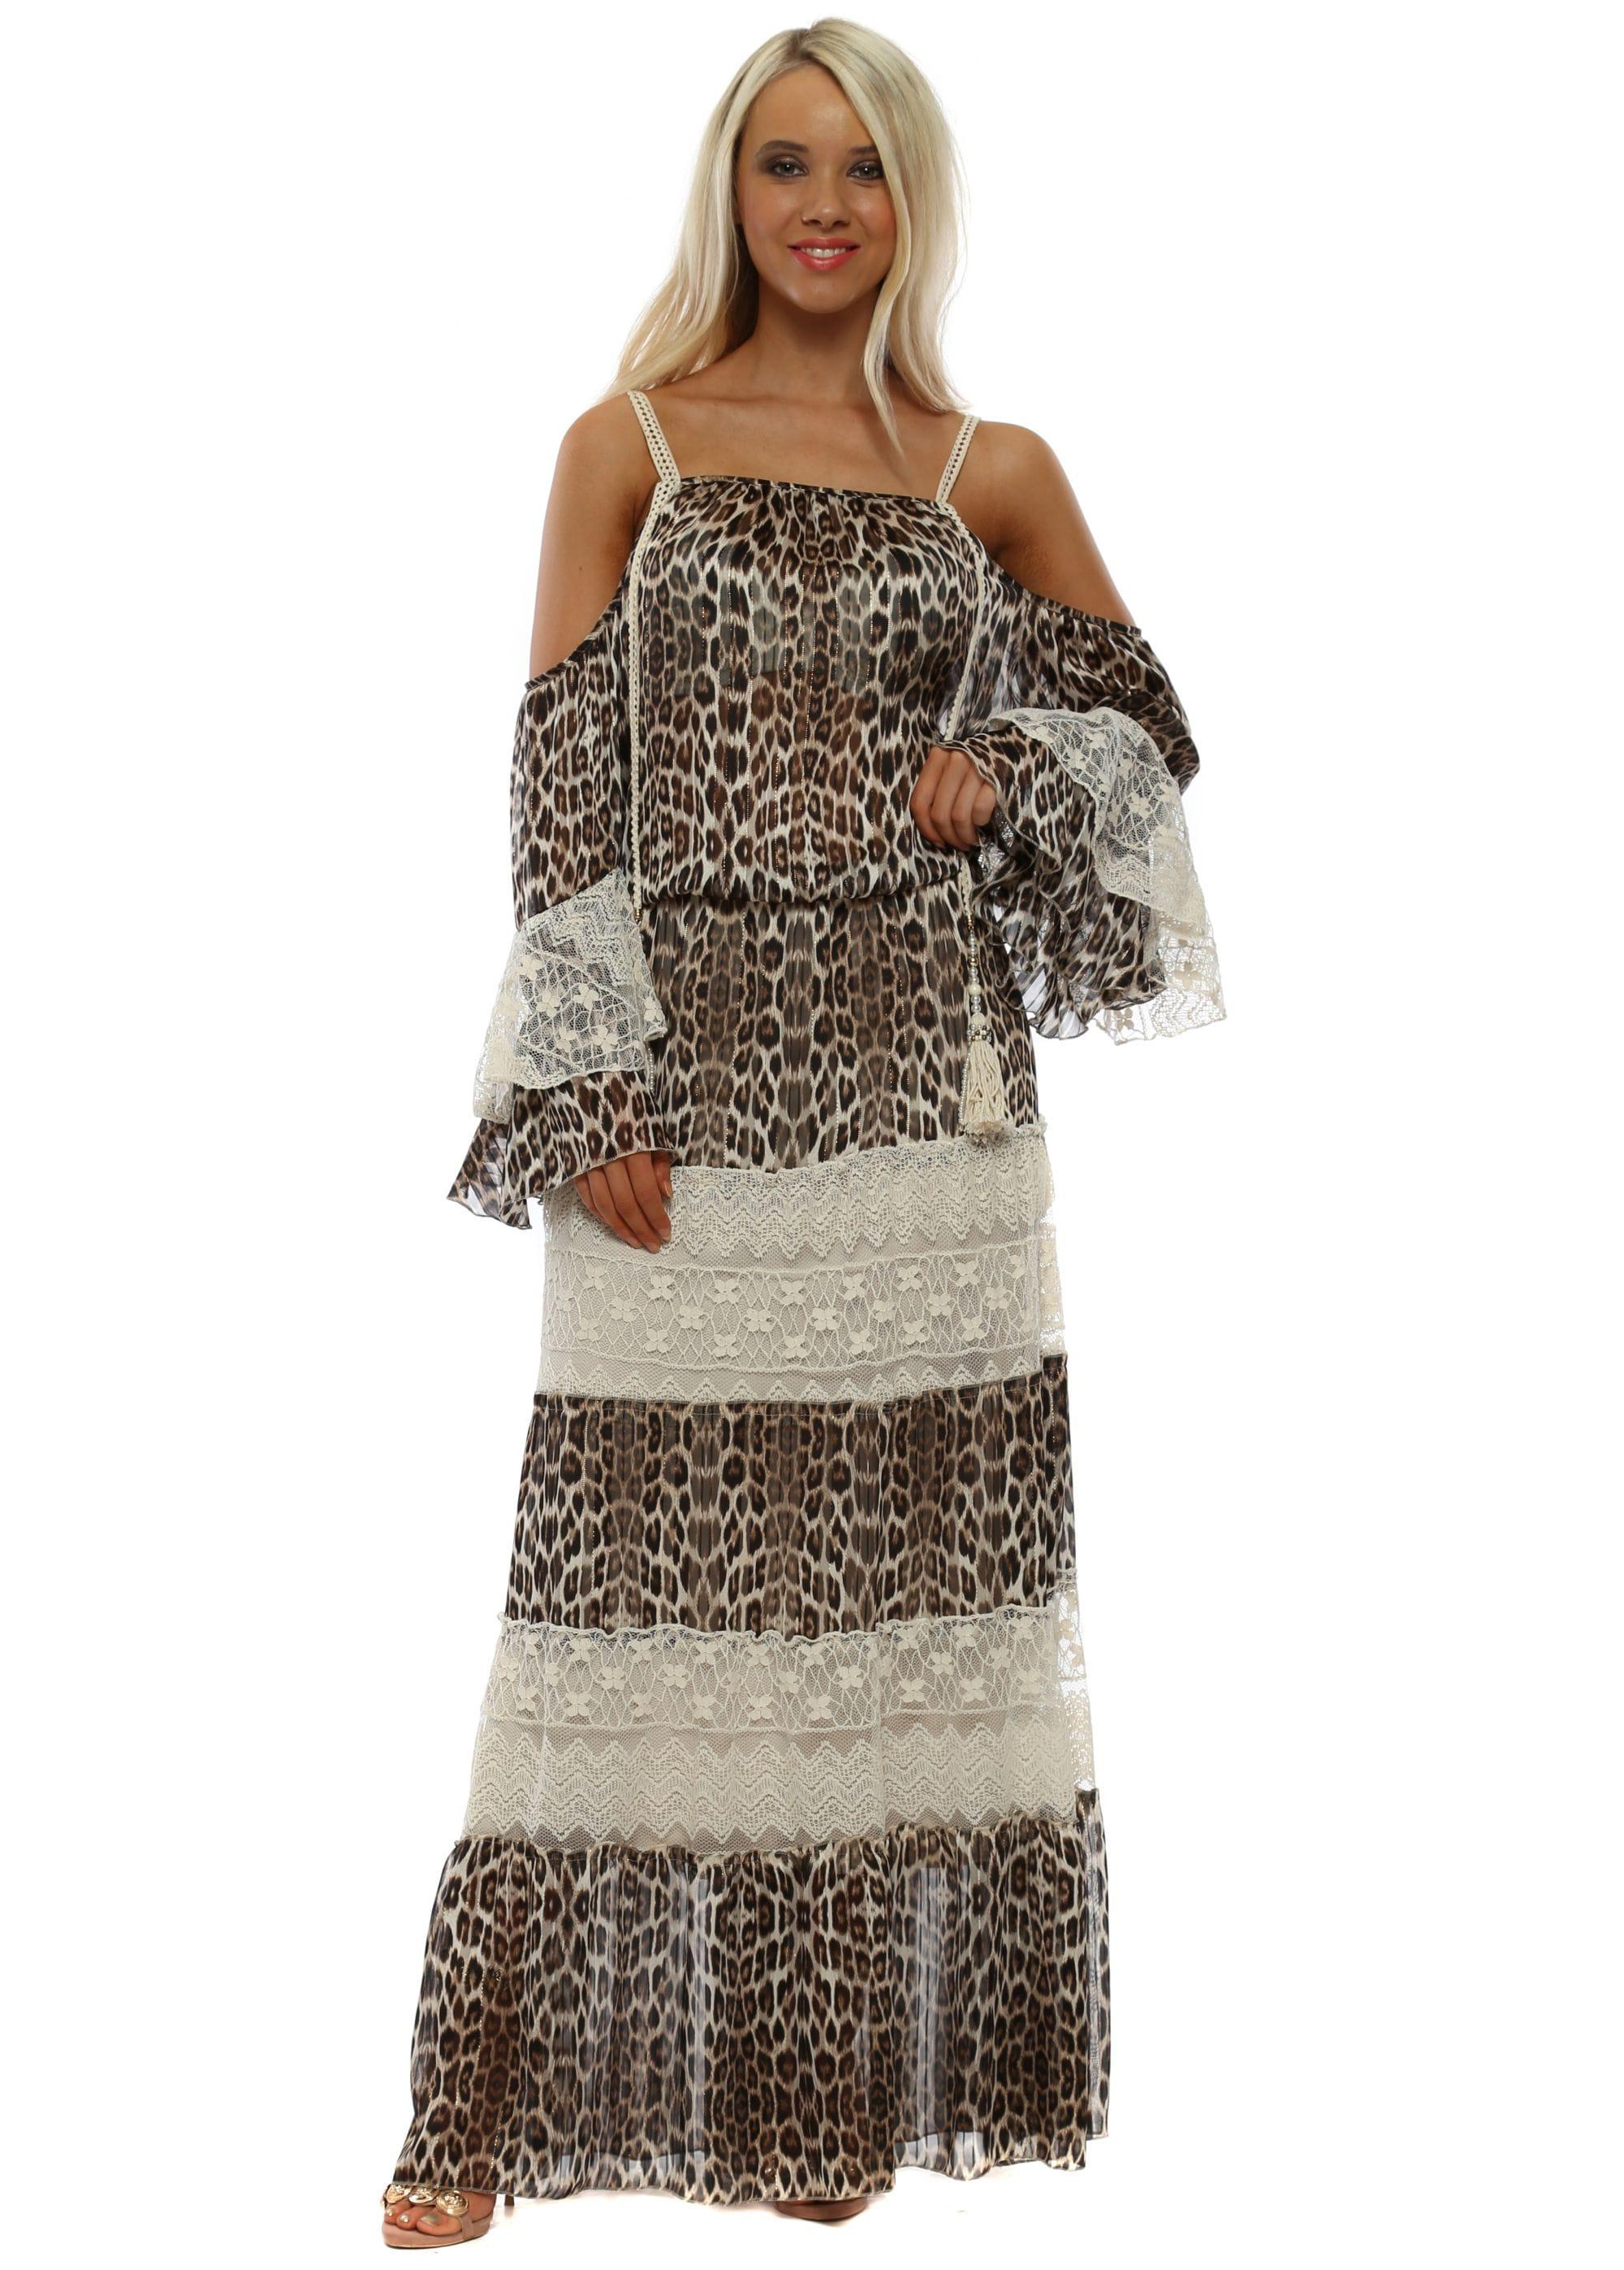 3a1d55c760c Leopard Print Tiered Lace Cold Shoulder Maxi Dress